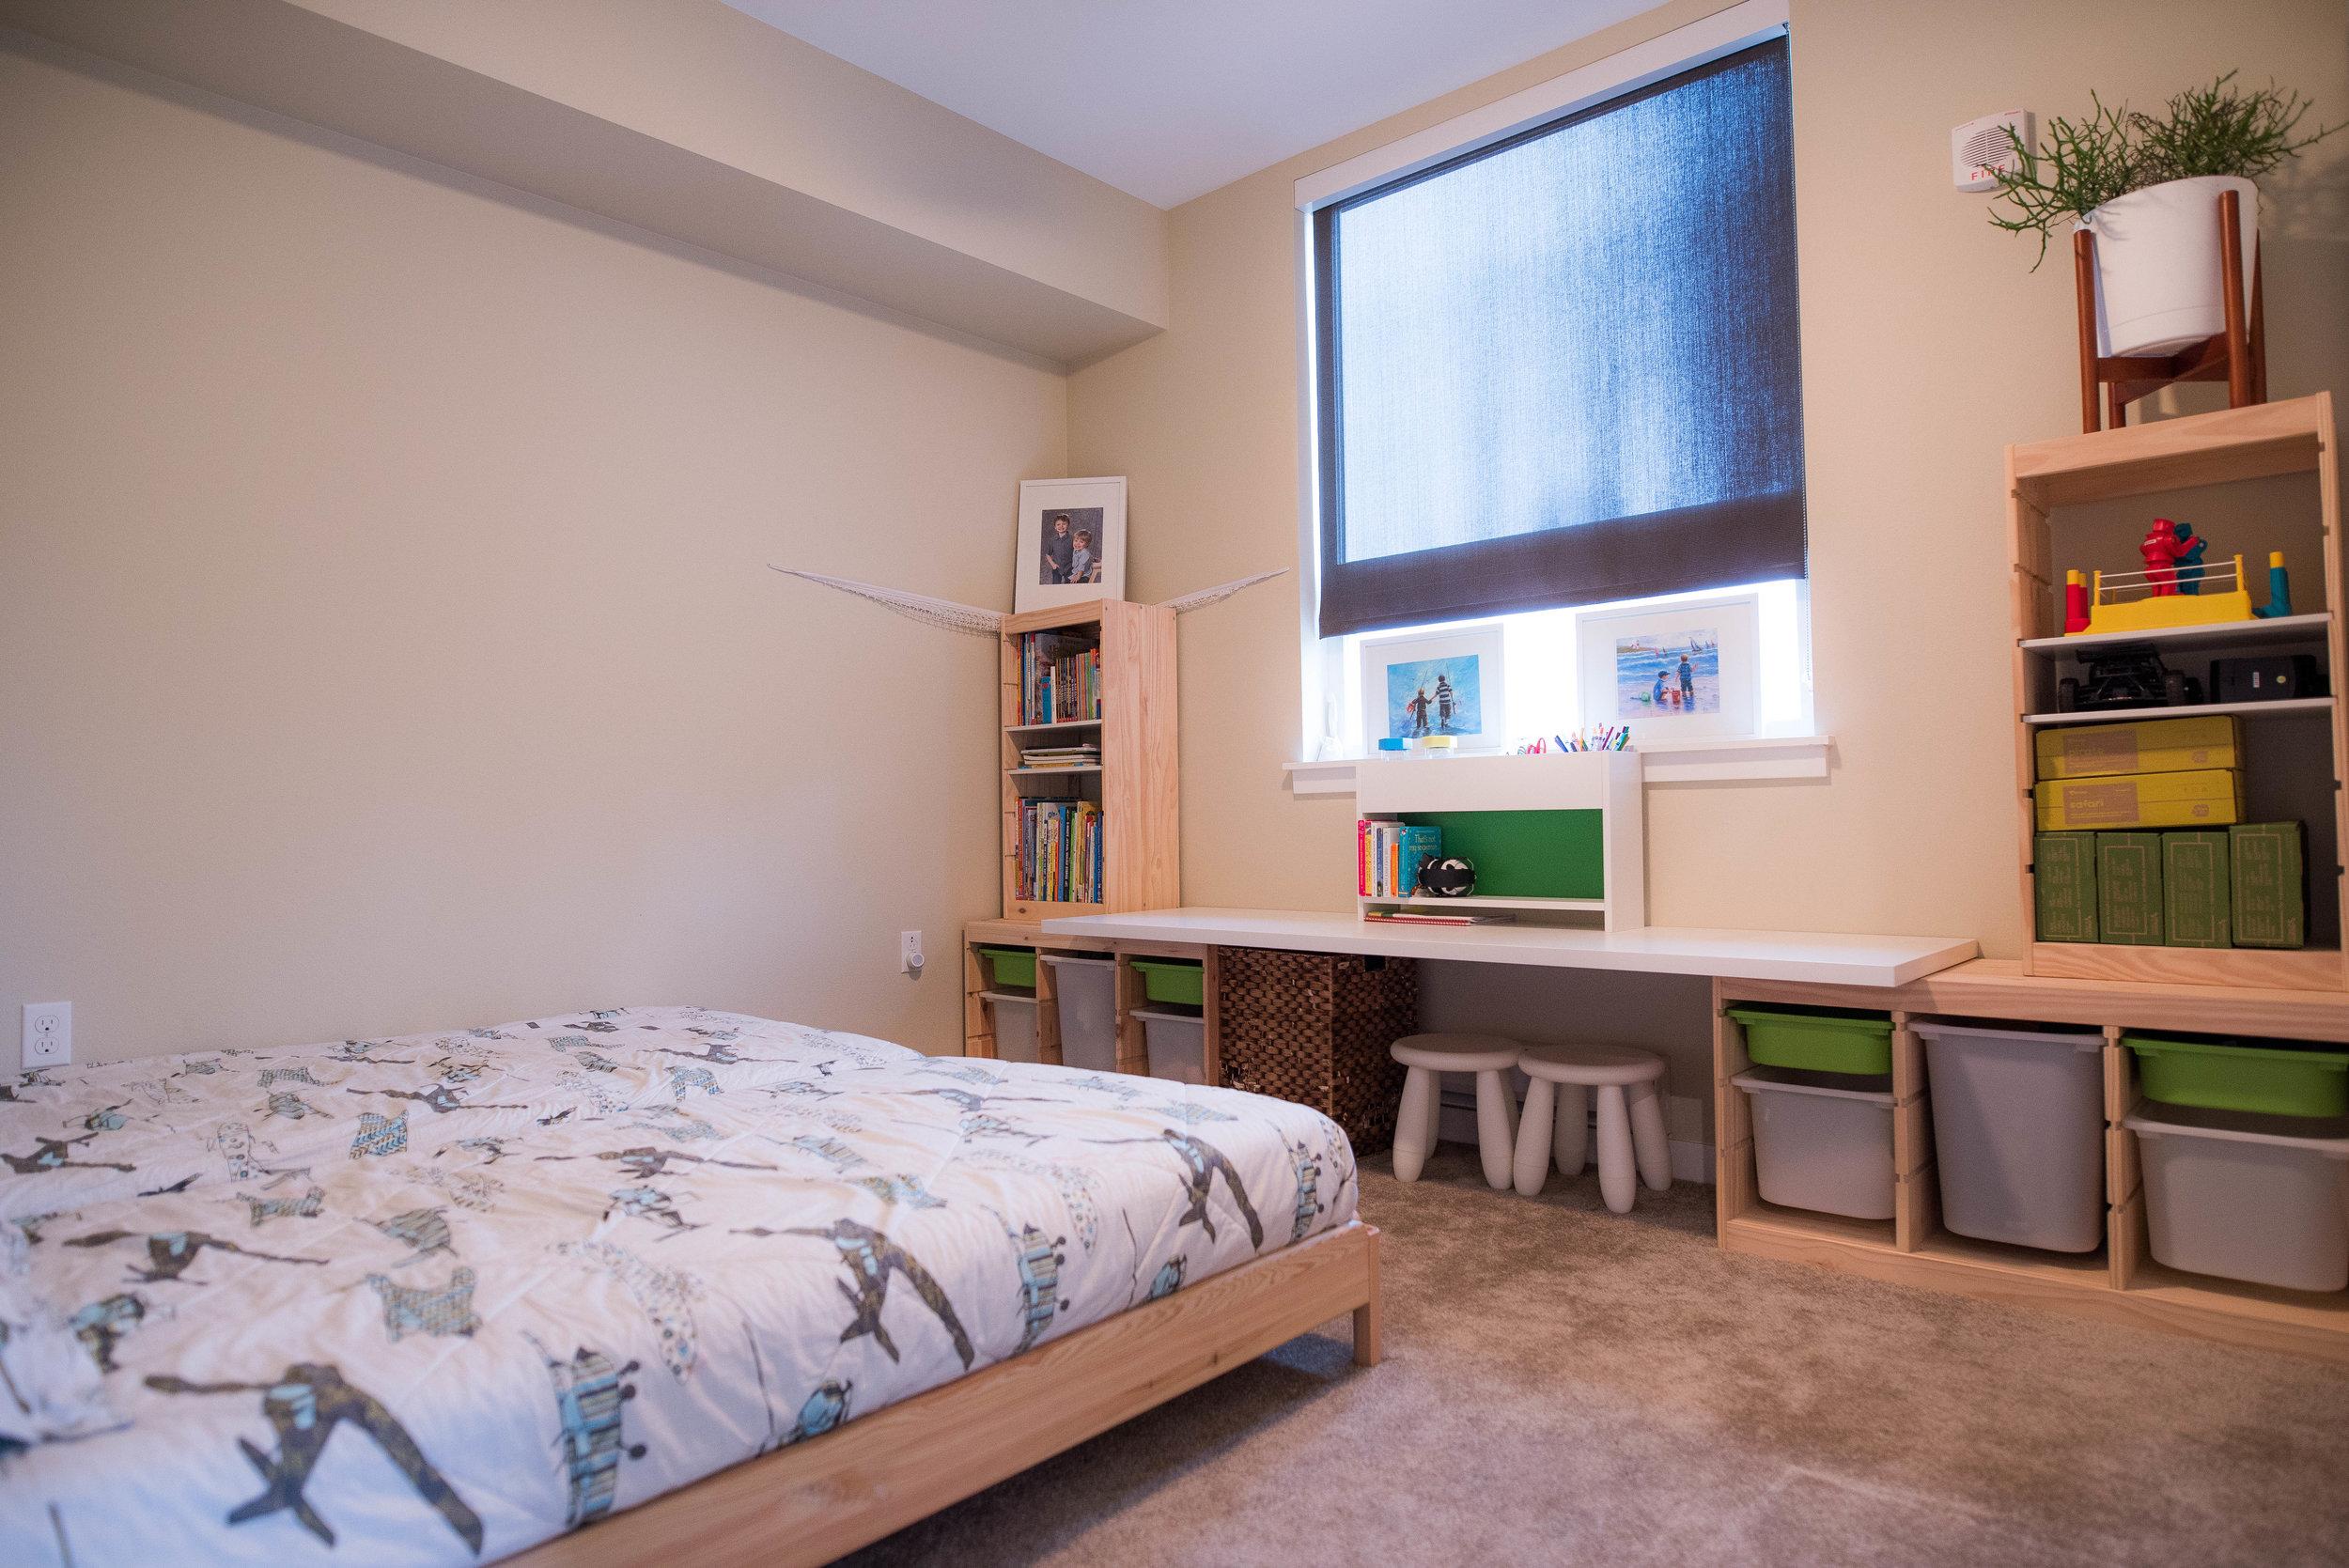 Minimalist kids' bedroom by Jennifer Russell